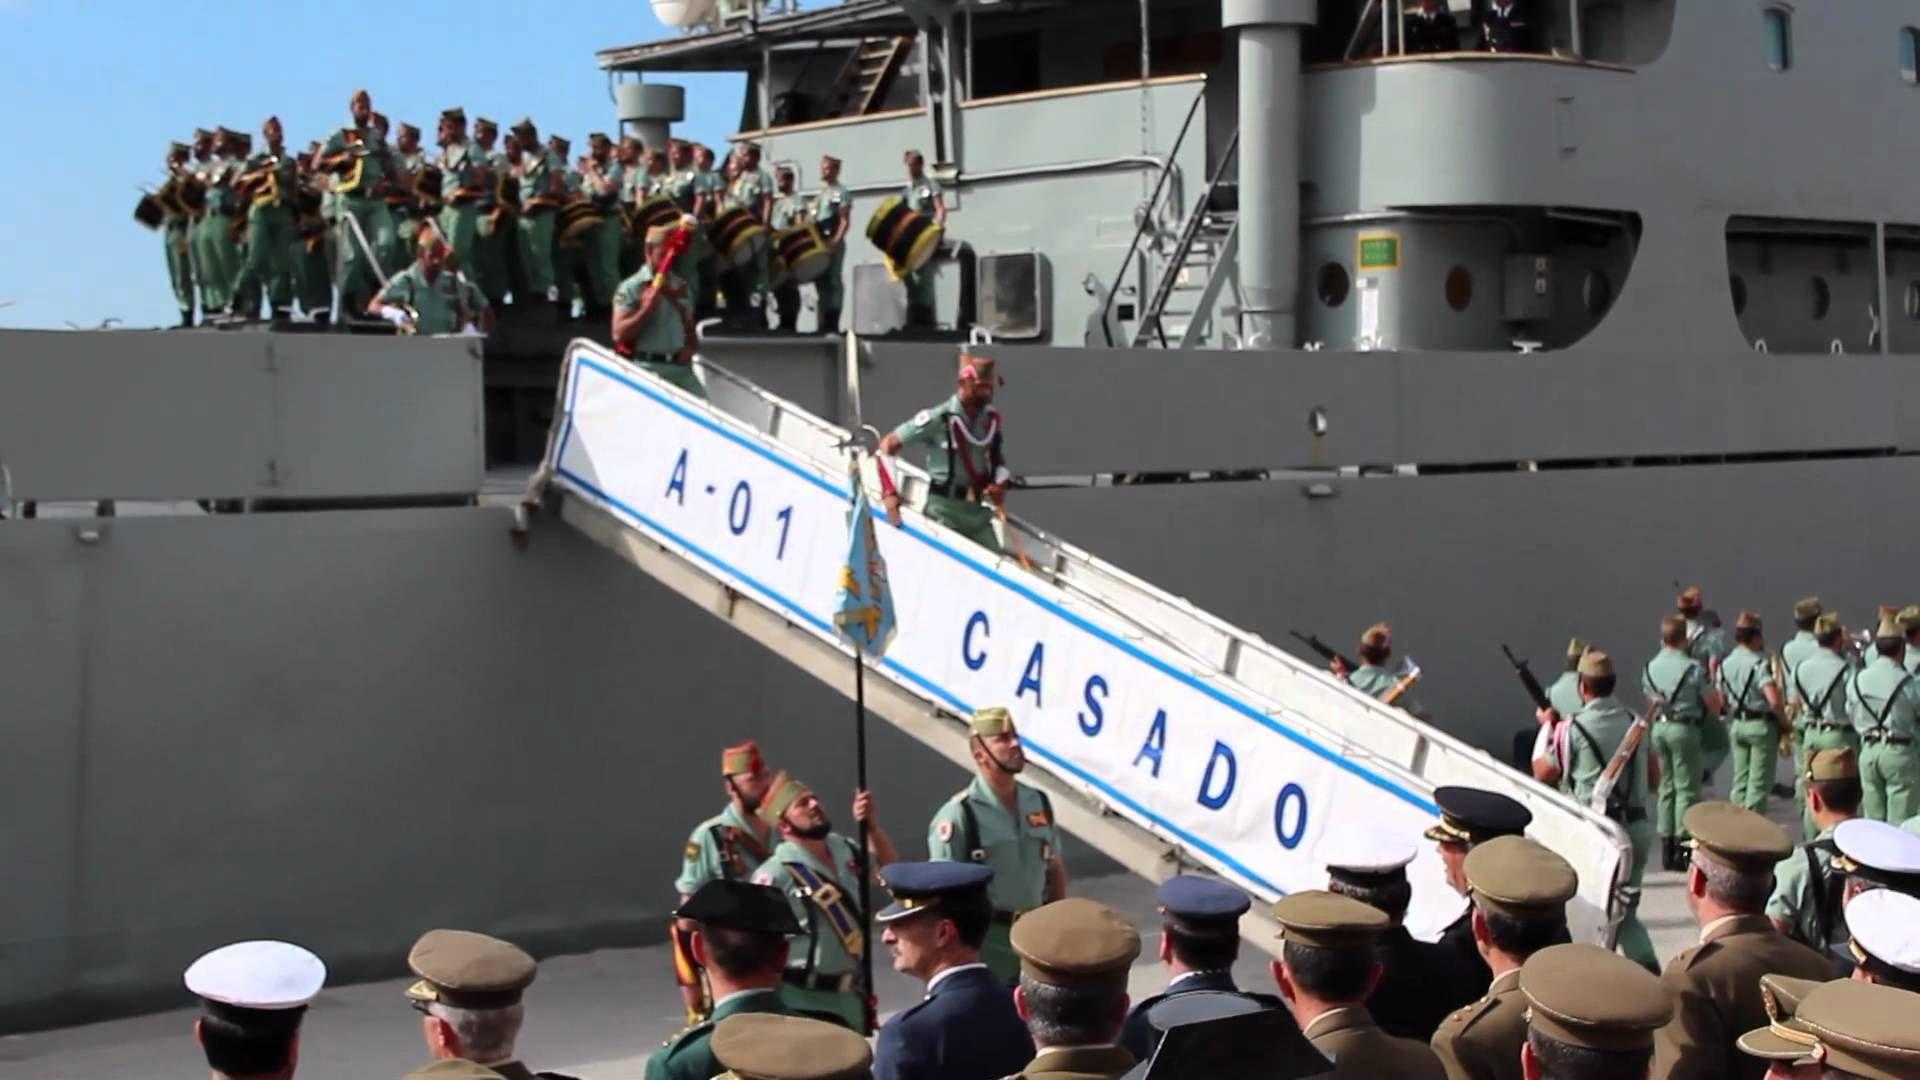 Desembarco Legion Semana Santa Malaga 73tv Semana Santa Málaga La Legion